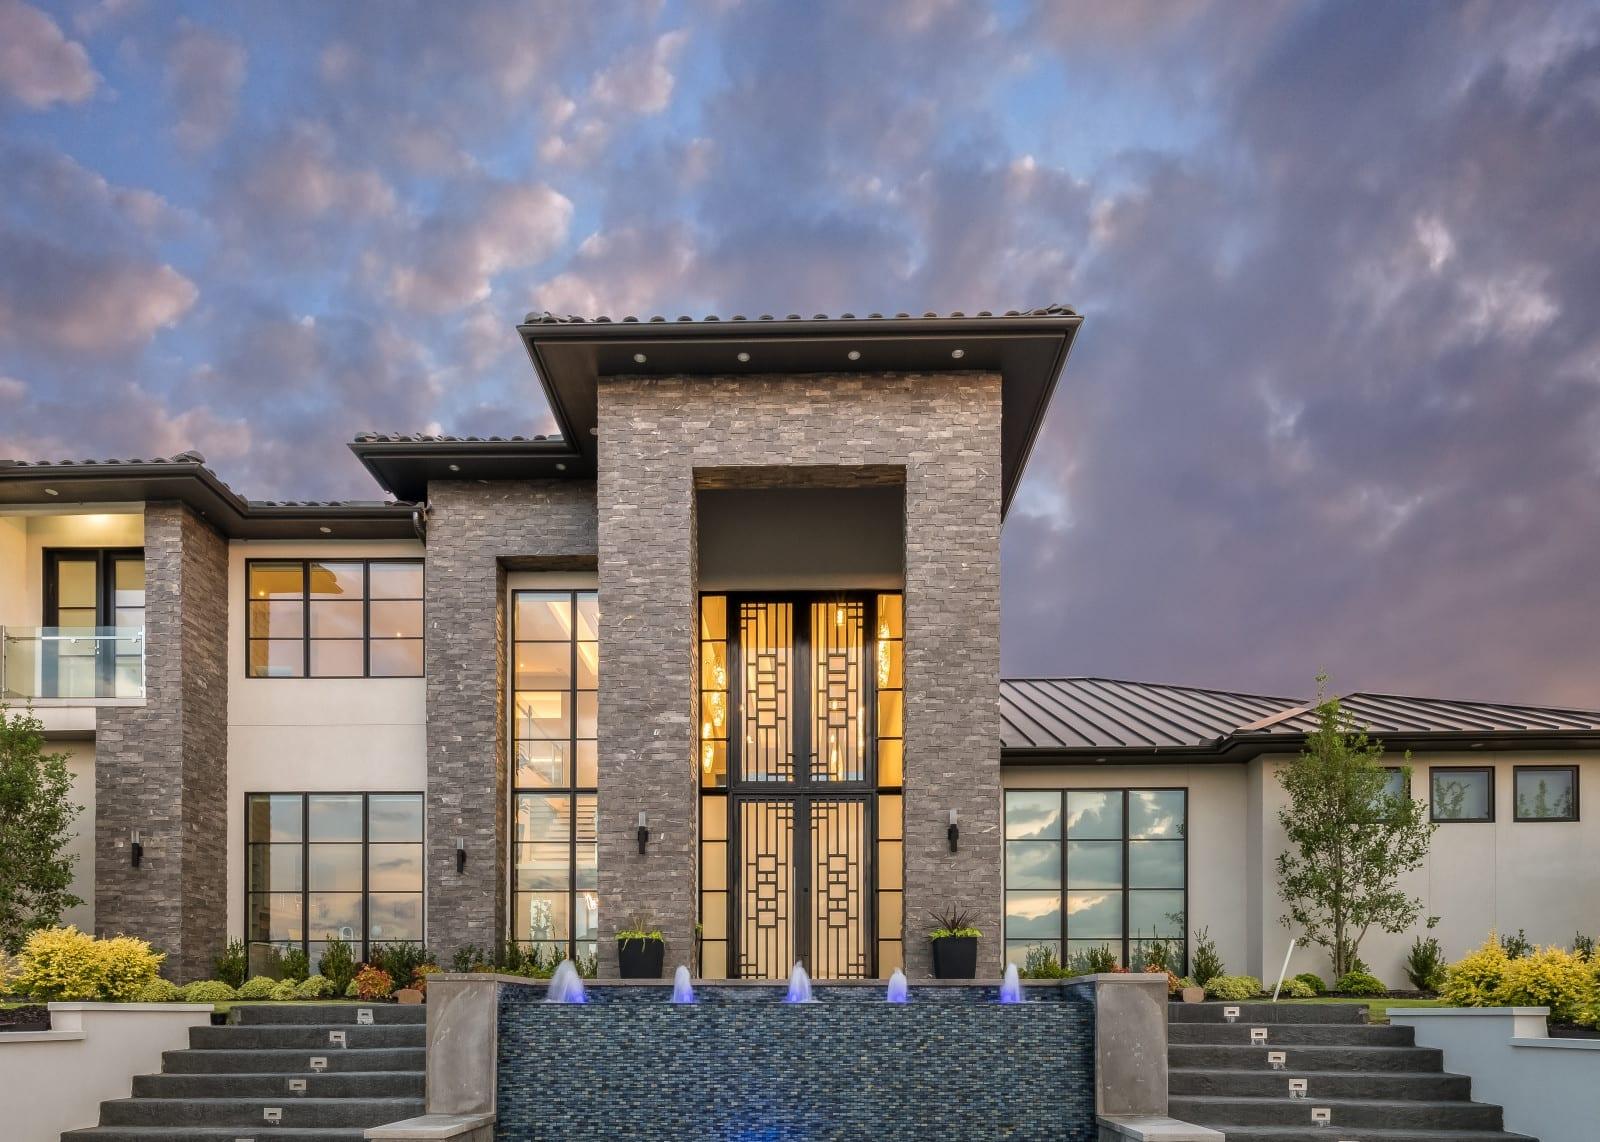 Custom Home Build and Interior Design # 33 - Millennial Design + Build, Home Builders in Dallas Texas, modern style homes, and custom home builders in DFW